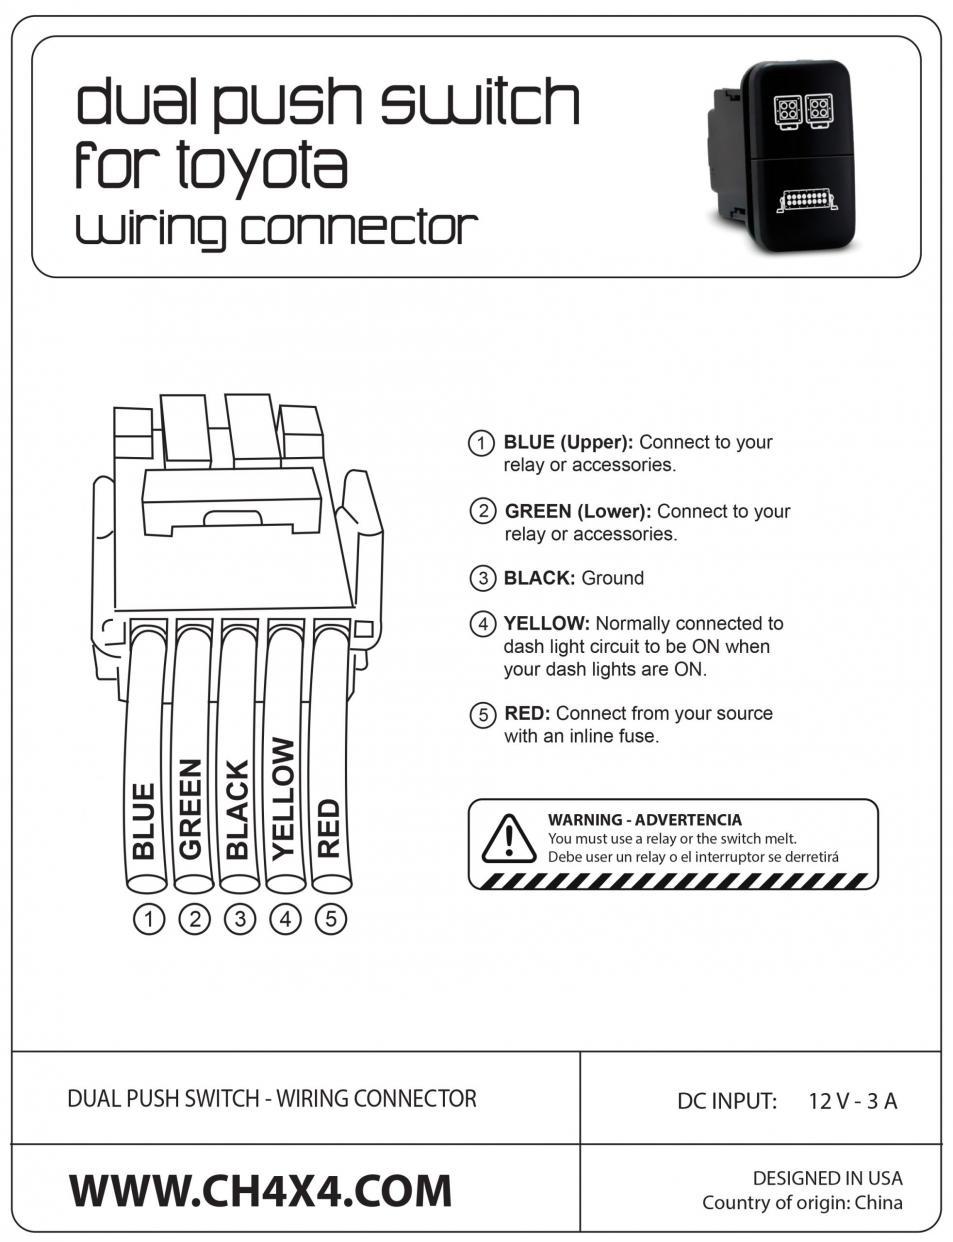 Switch Wiring-dual-toyota-push-switch-wiring-scaled-jpg